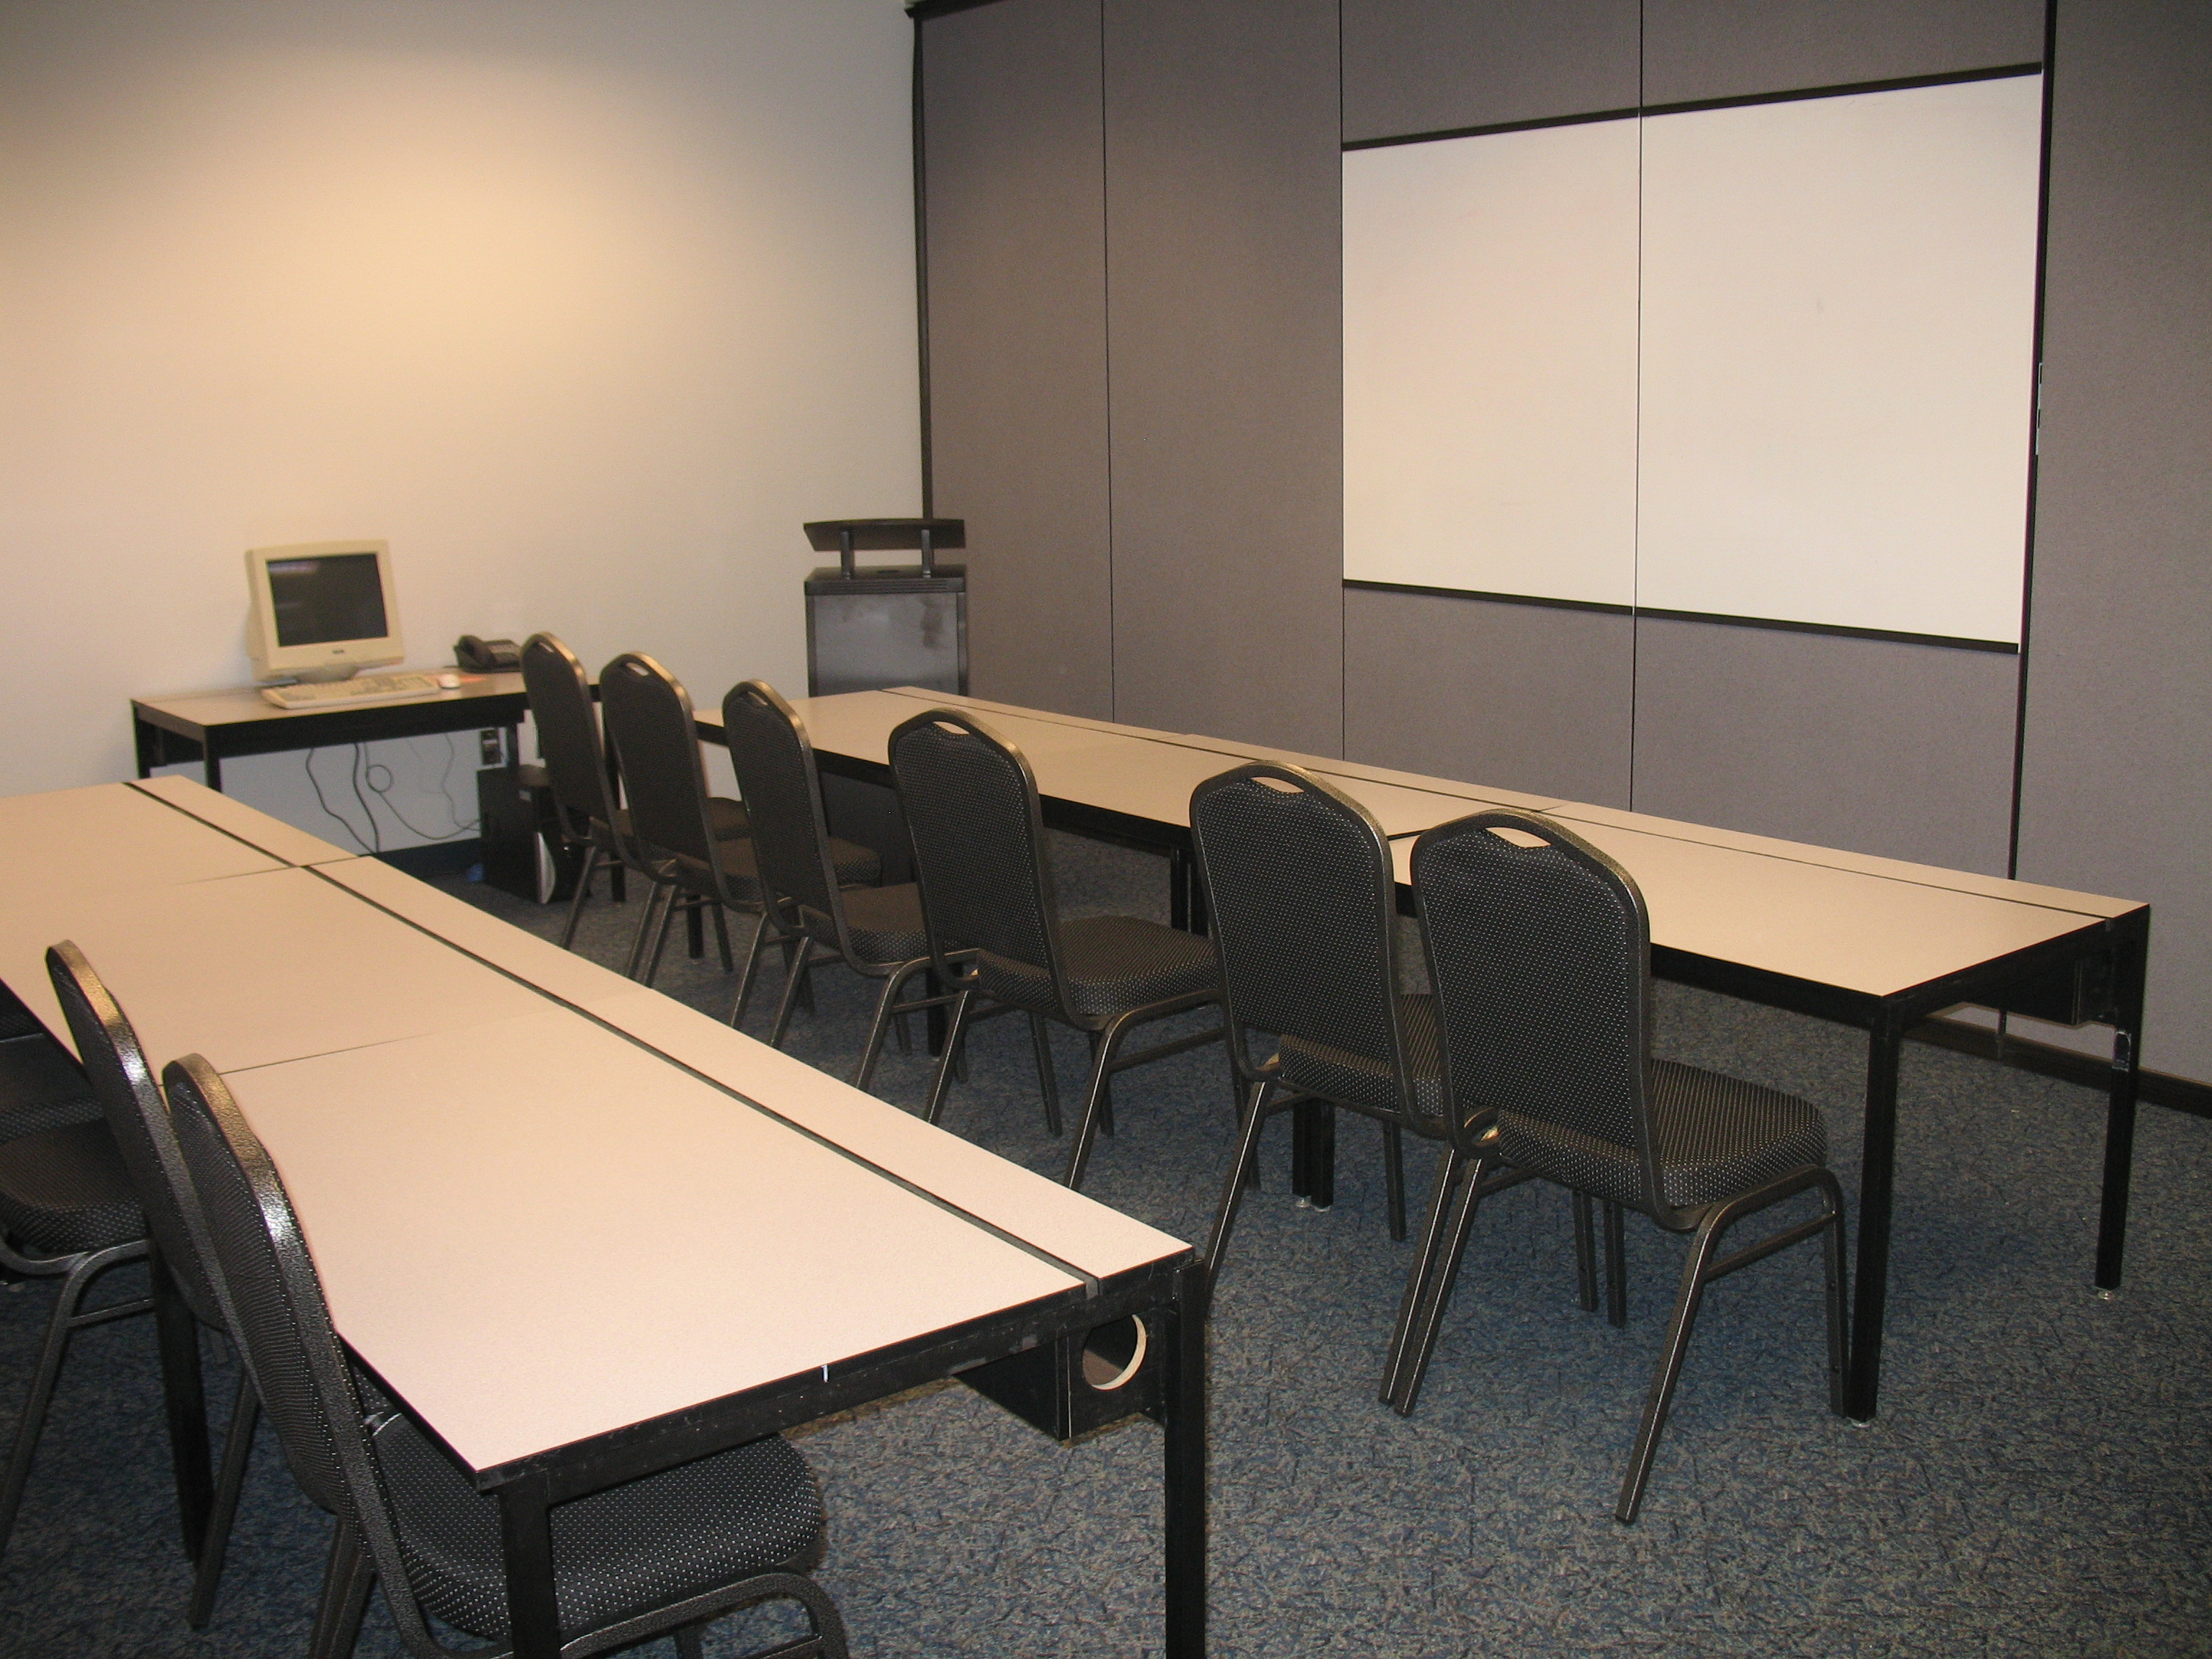 council-bluffs-airport-terminal-conferance-room1